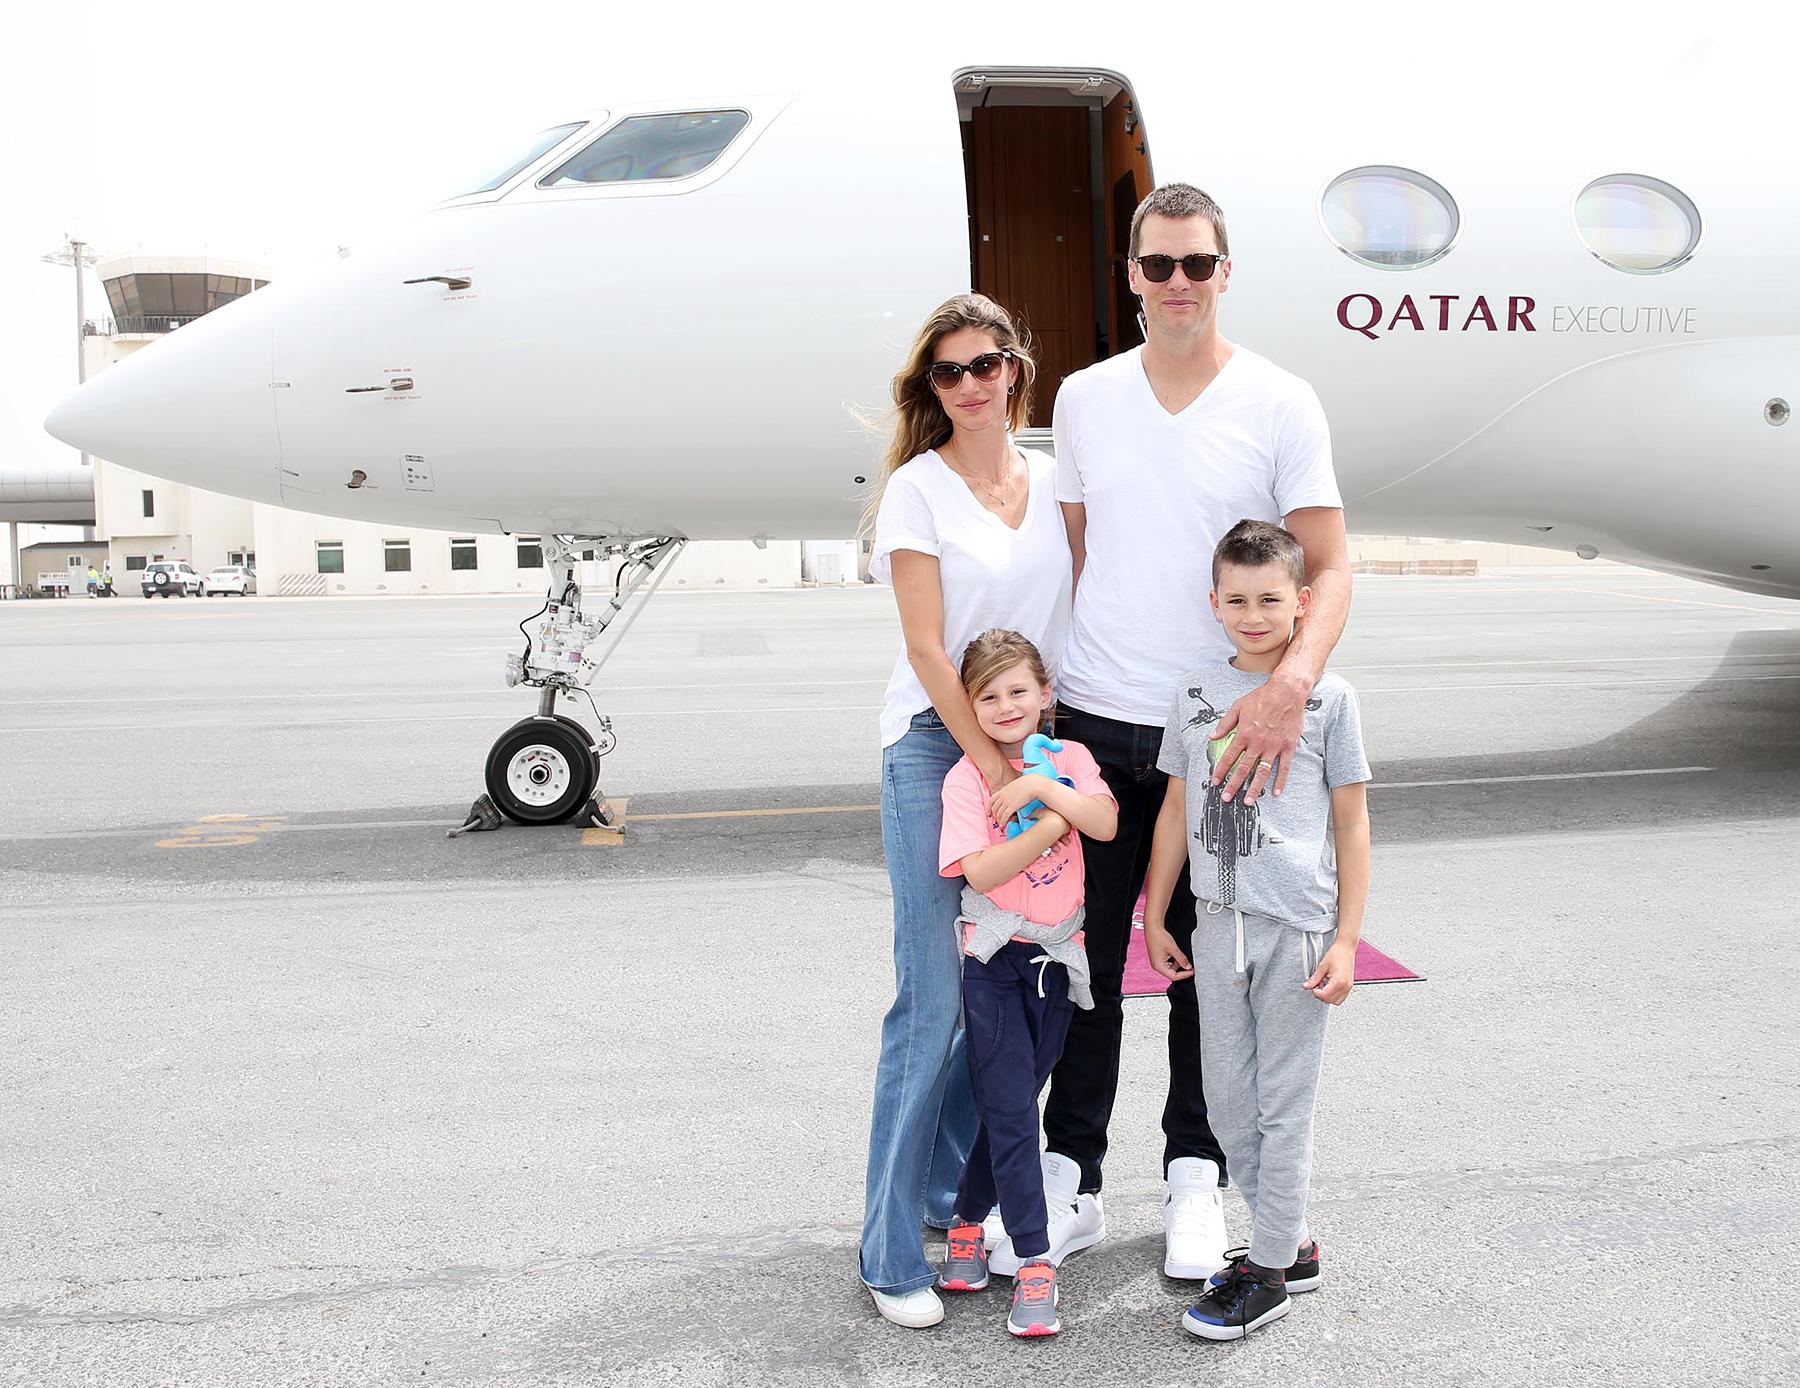 Tom Brady, Gisele Bundchen's Family Vacation to Qatar: Details